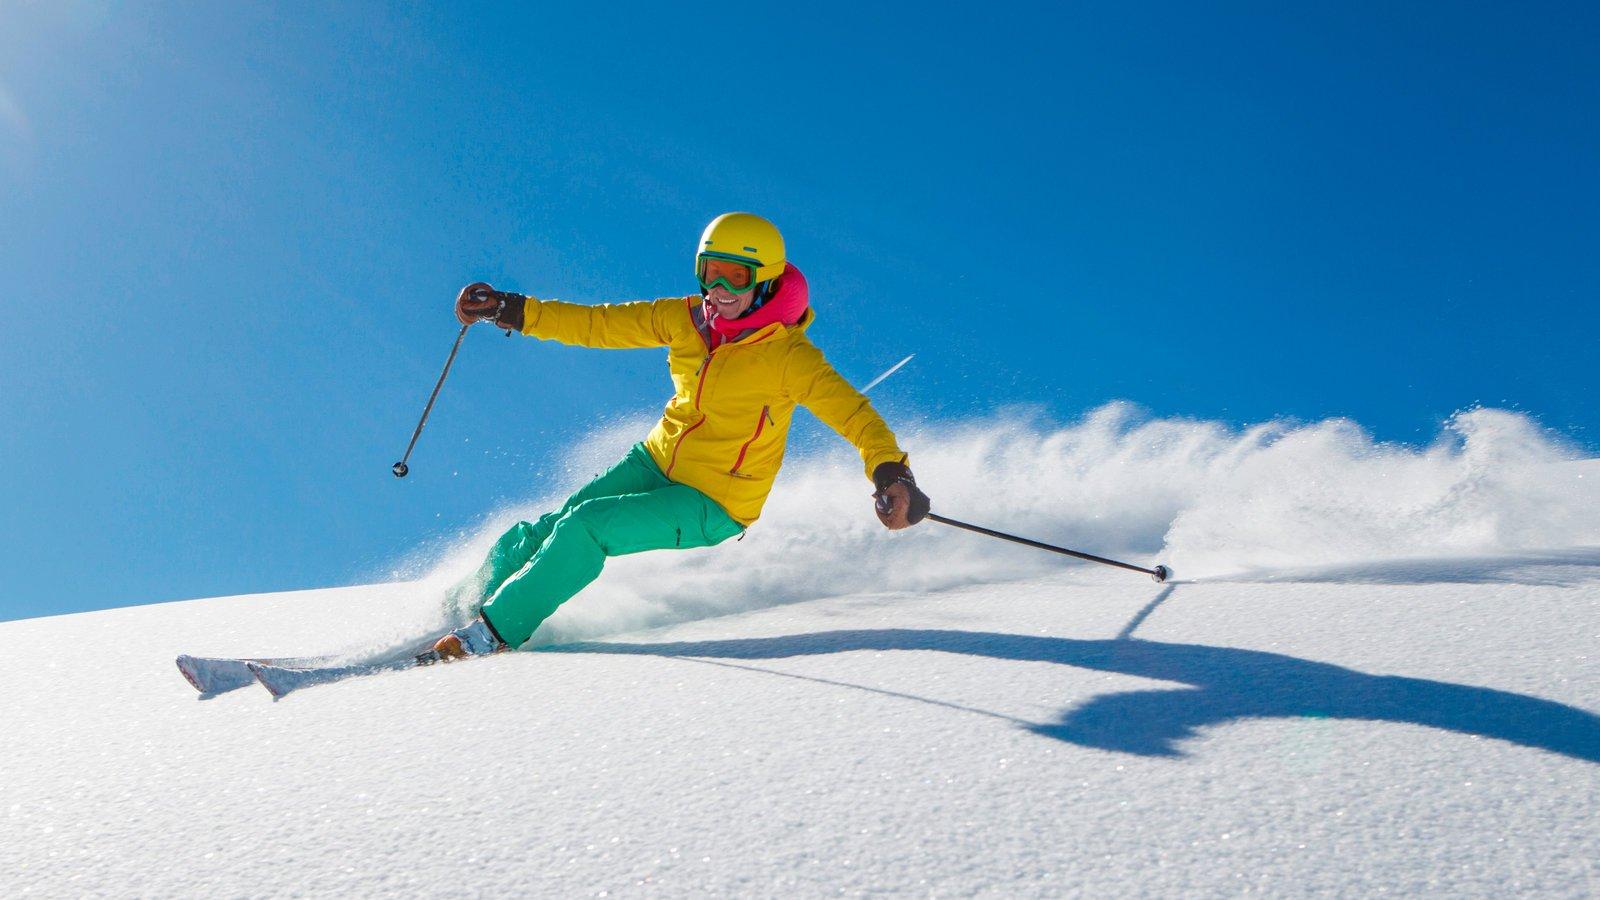 Top 10 Best Ski Resorts in California